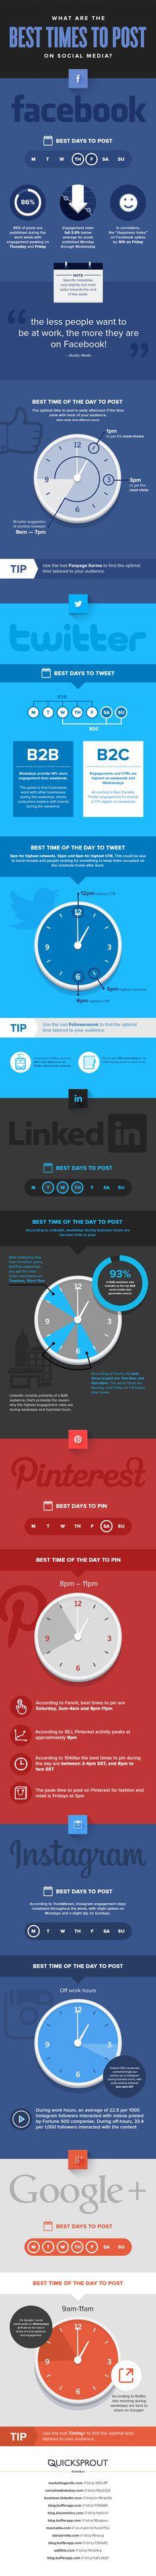 postingstrategie-social-media-content-planung-top-posting-zeiten-infografik-posting-tipps-strategie.jpg 1.000×16.500 Pixel